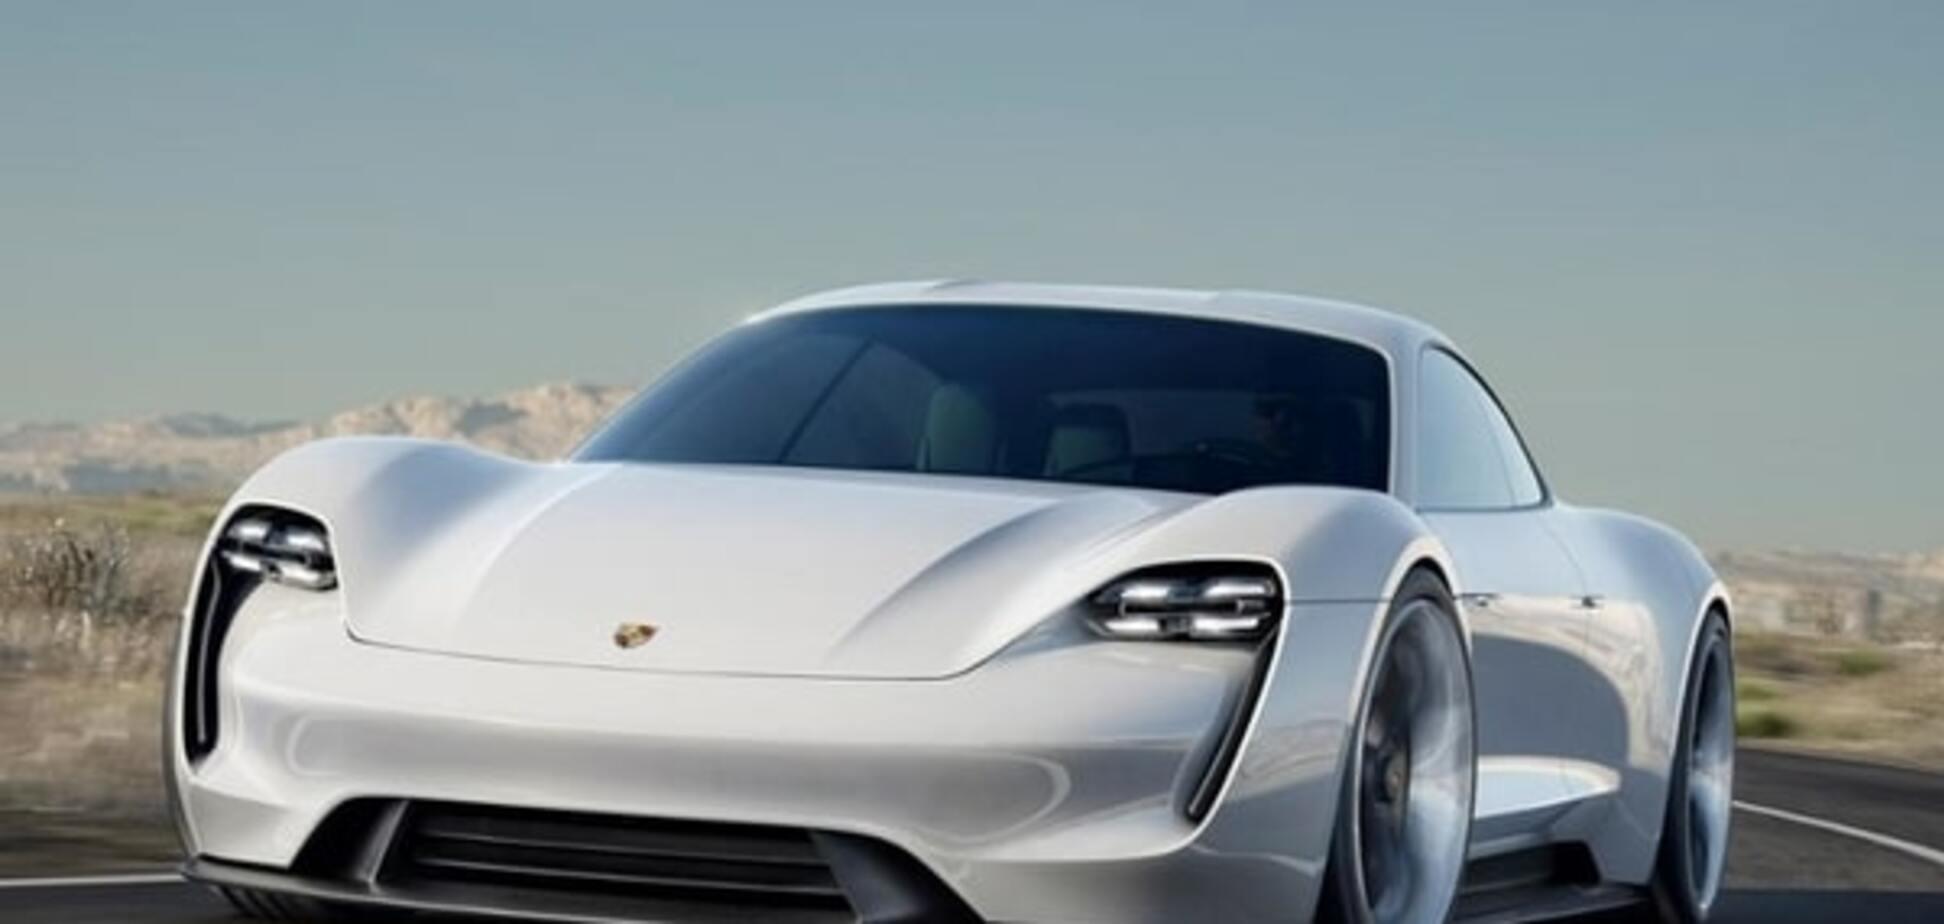 Франкфуртский автосалон: Porsche представил агрессивный суперкар